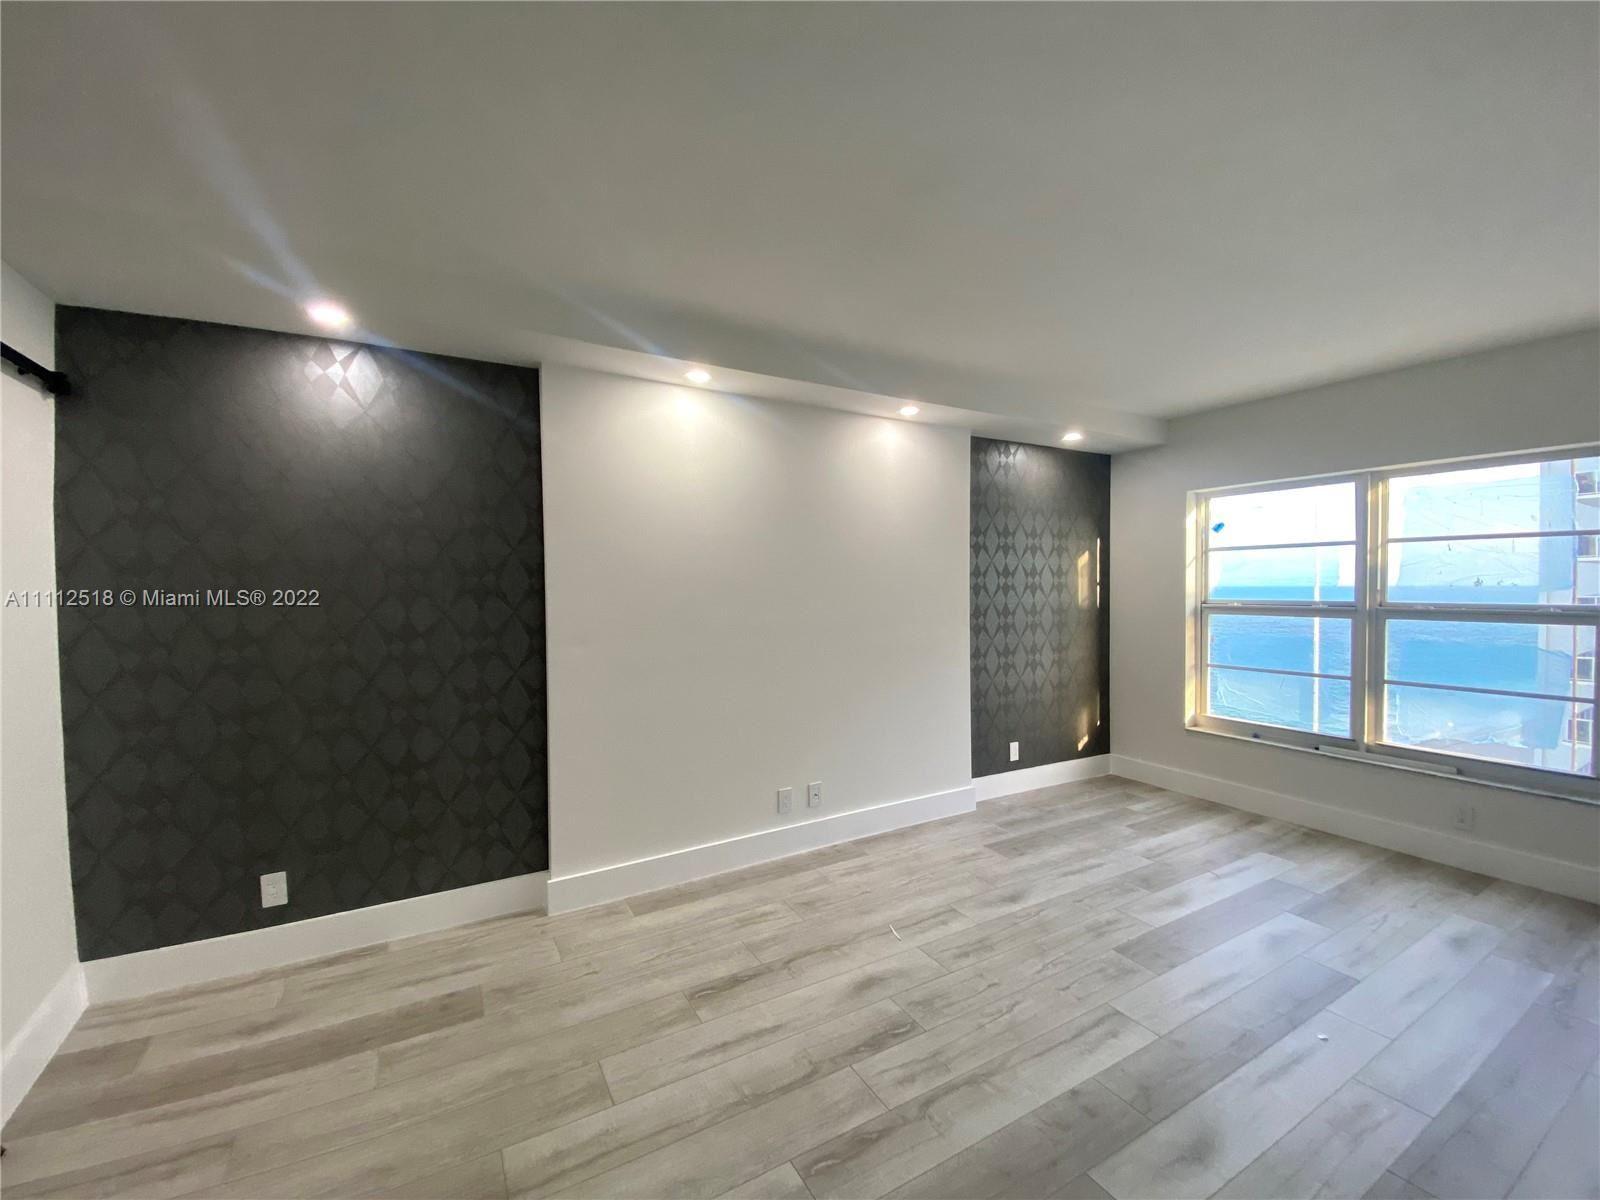 Photo of 3750 Galt Ocean Dr #1002, Fort Lauderdale, FL 33308 (MLS # A11112518)